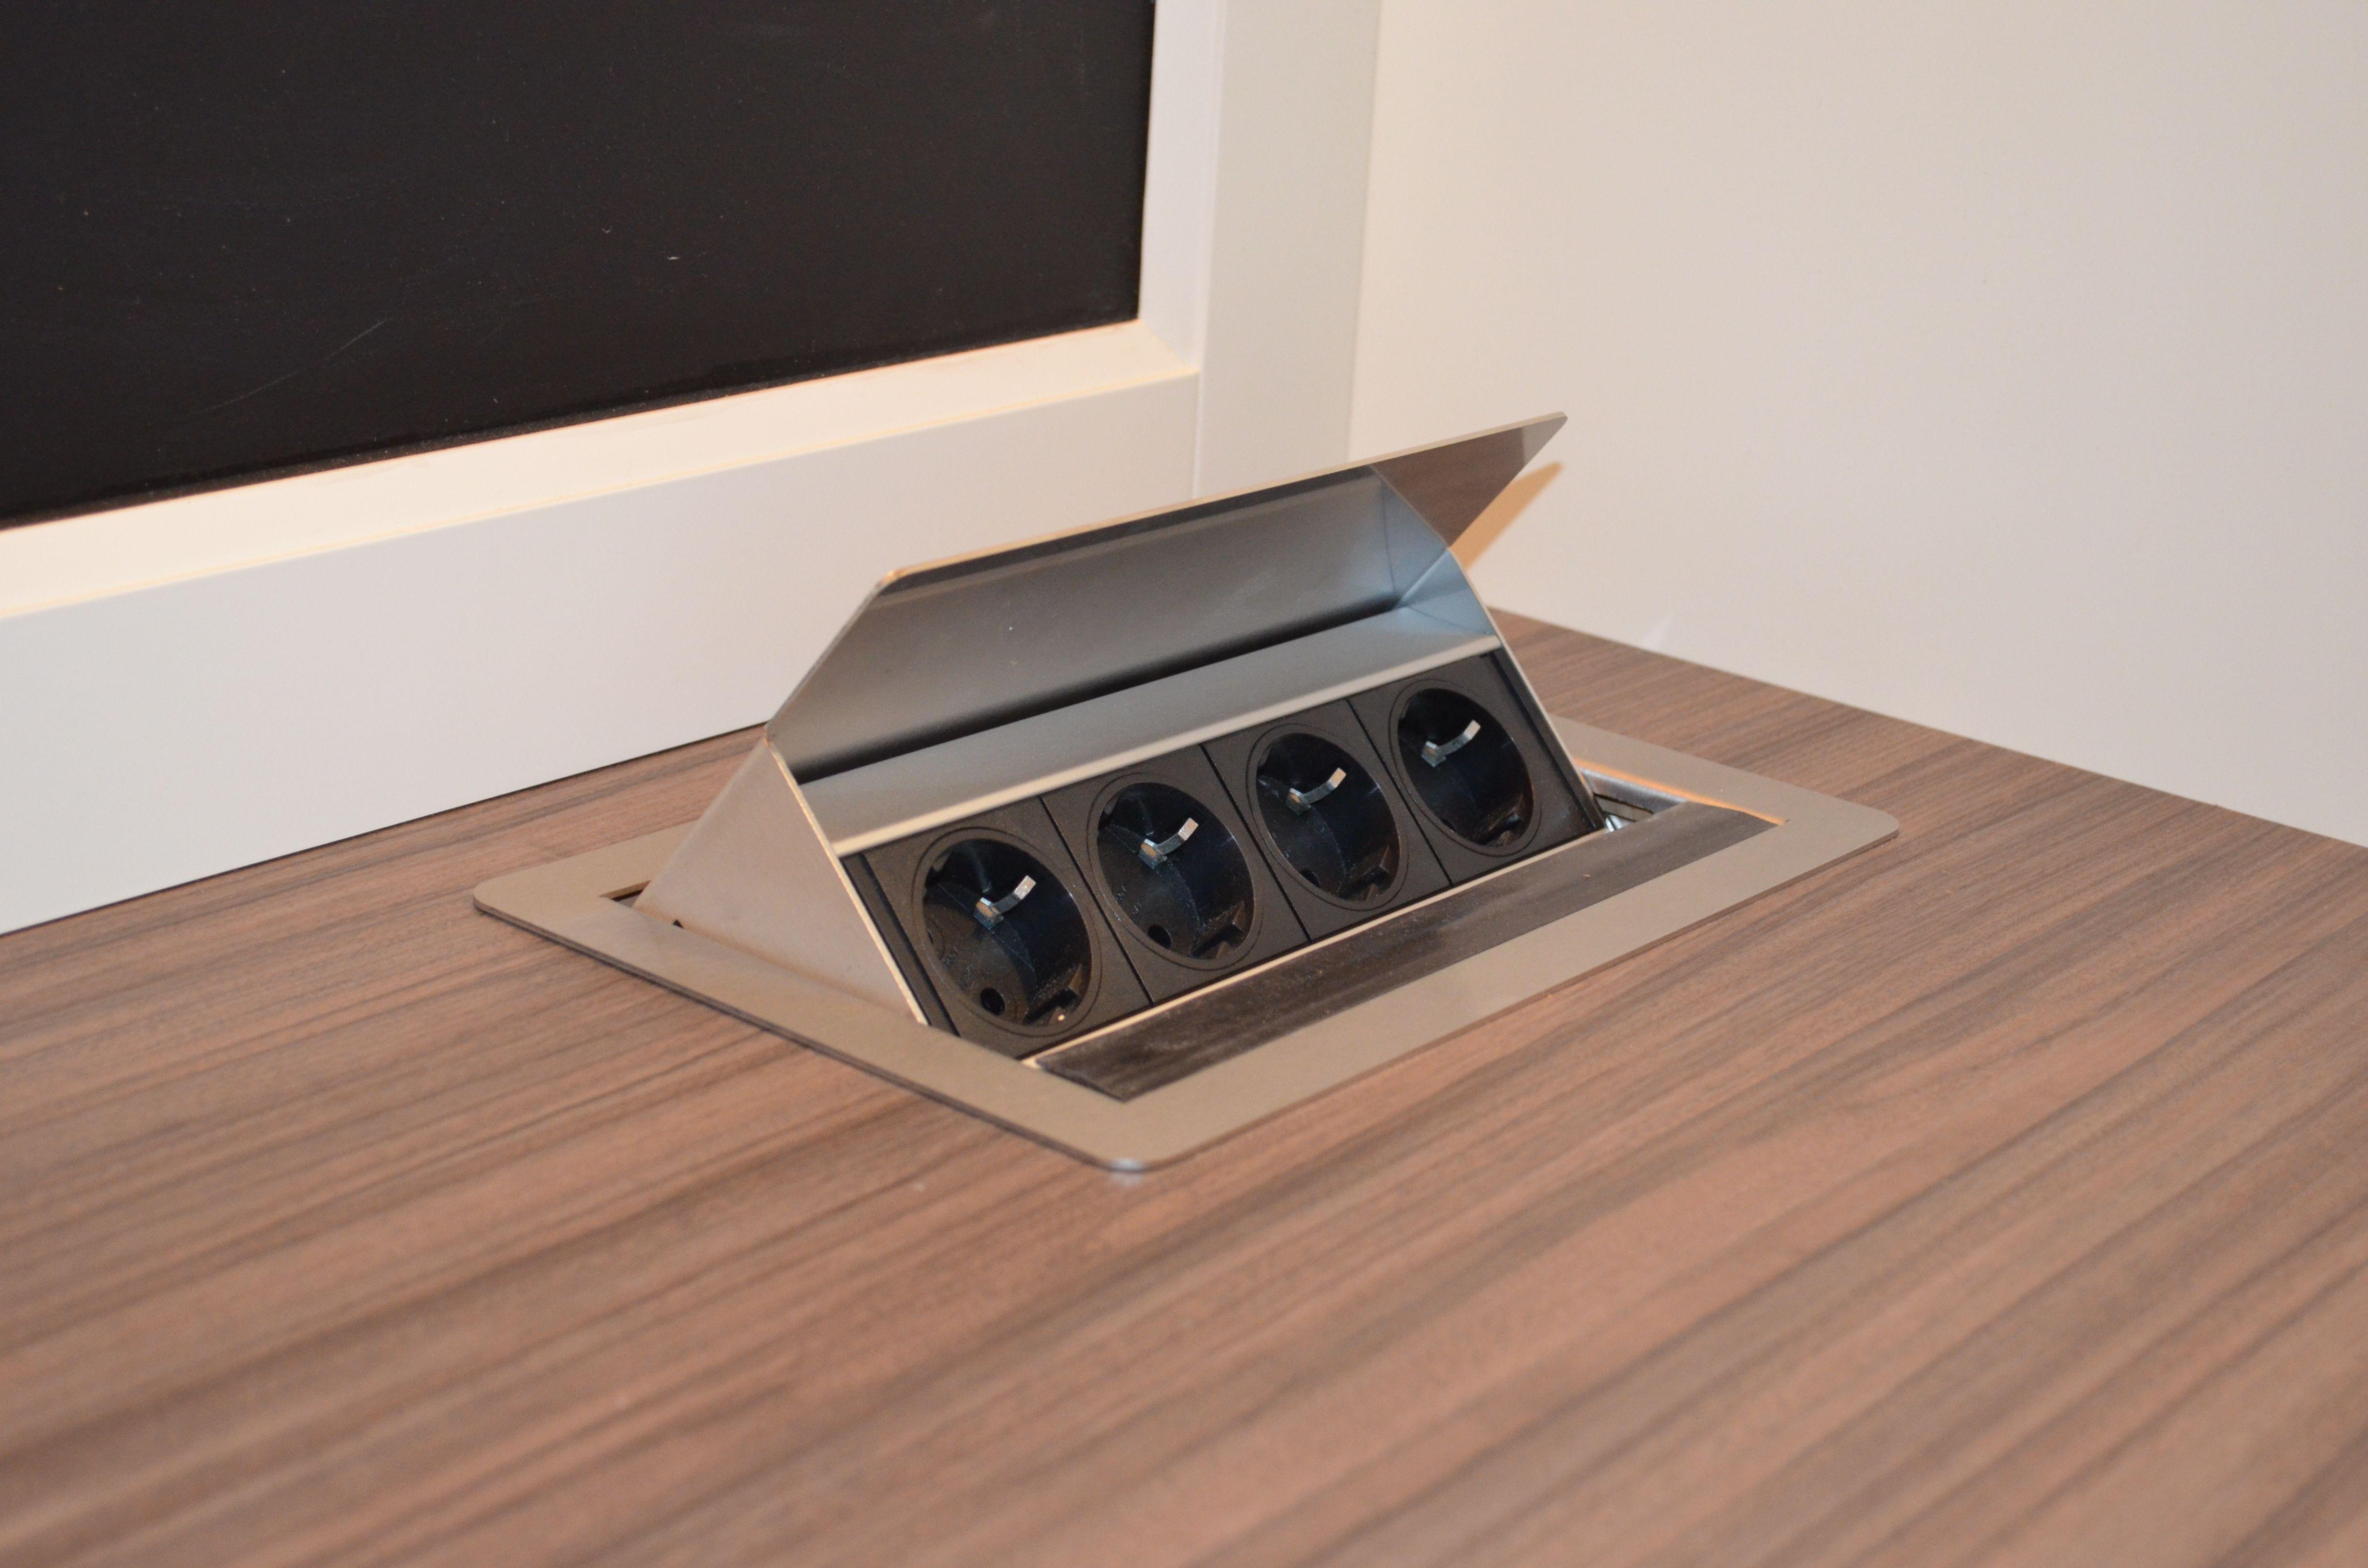 Arbeitsplatte Mit Versenkbaren Steckdosen Steckdosen Kuche Versenkbare Steckdose Badezimmer Aufbewahrung